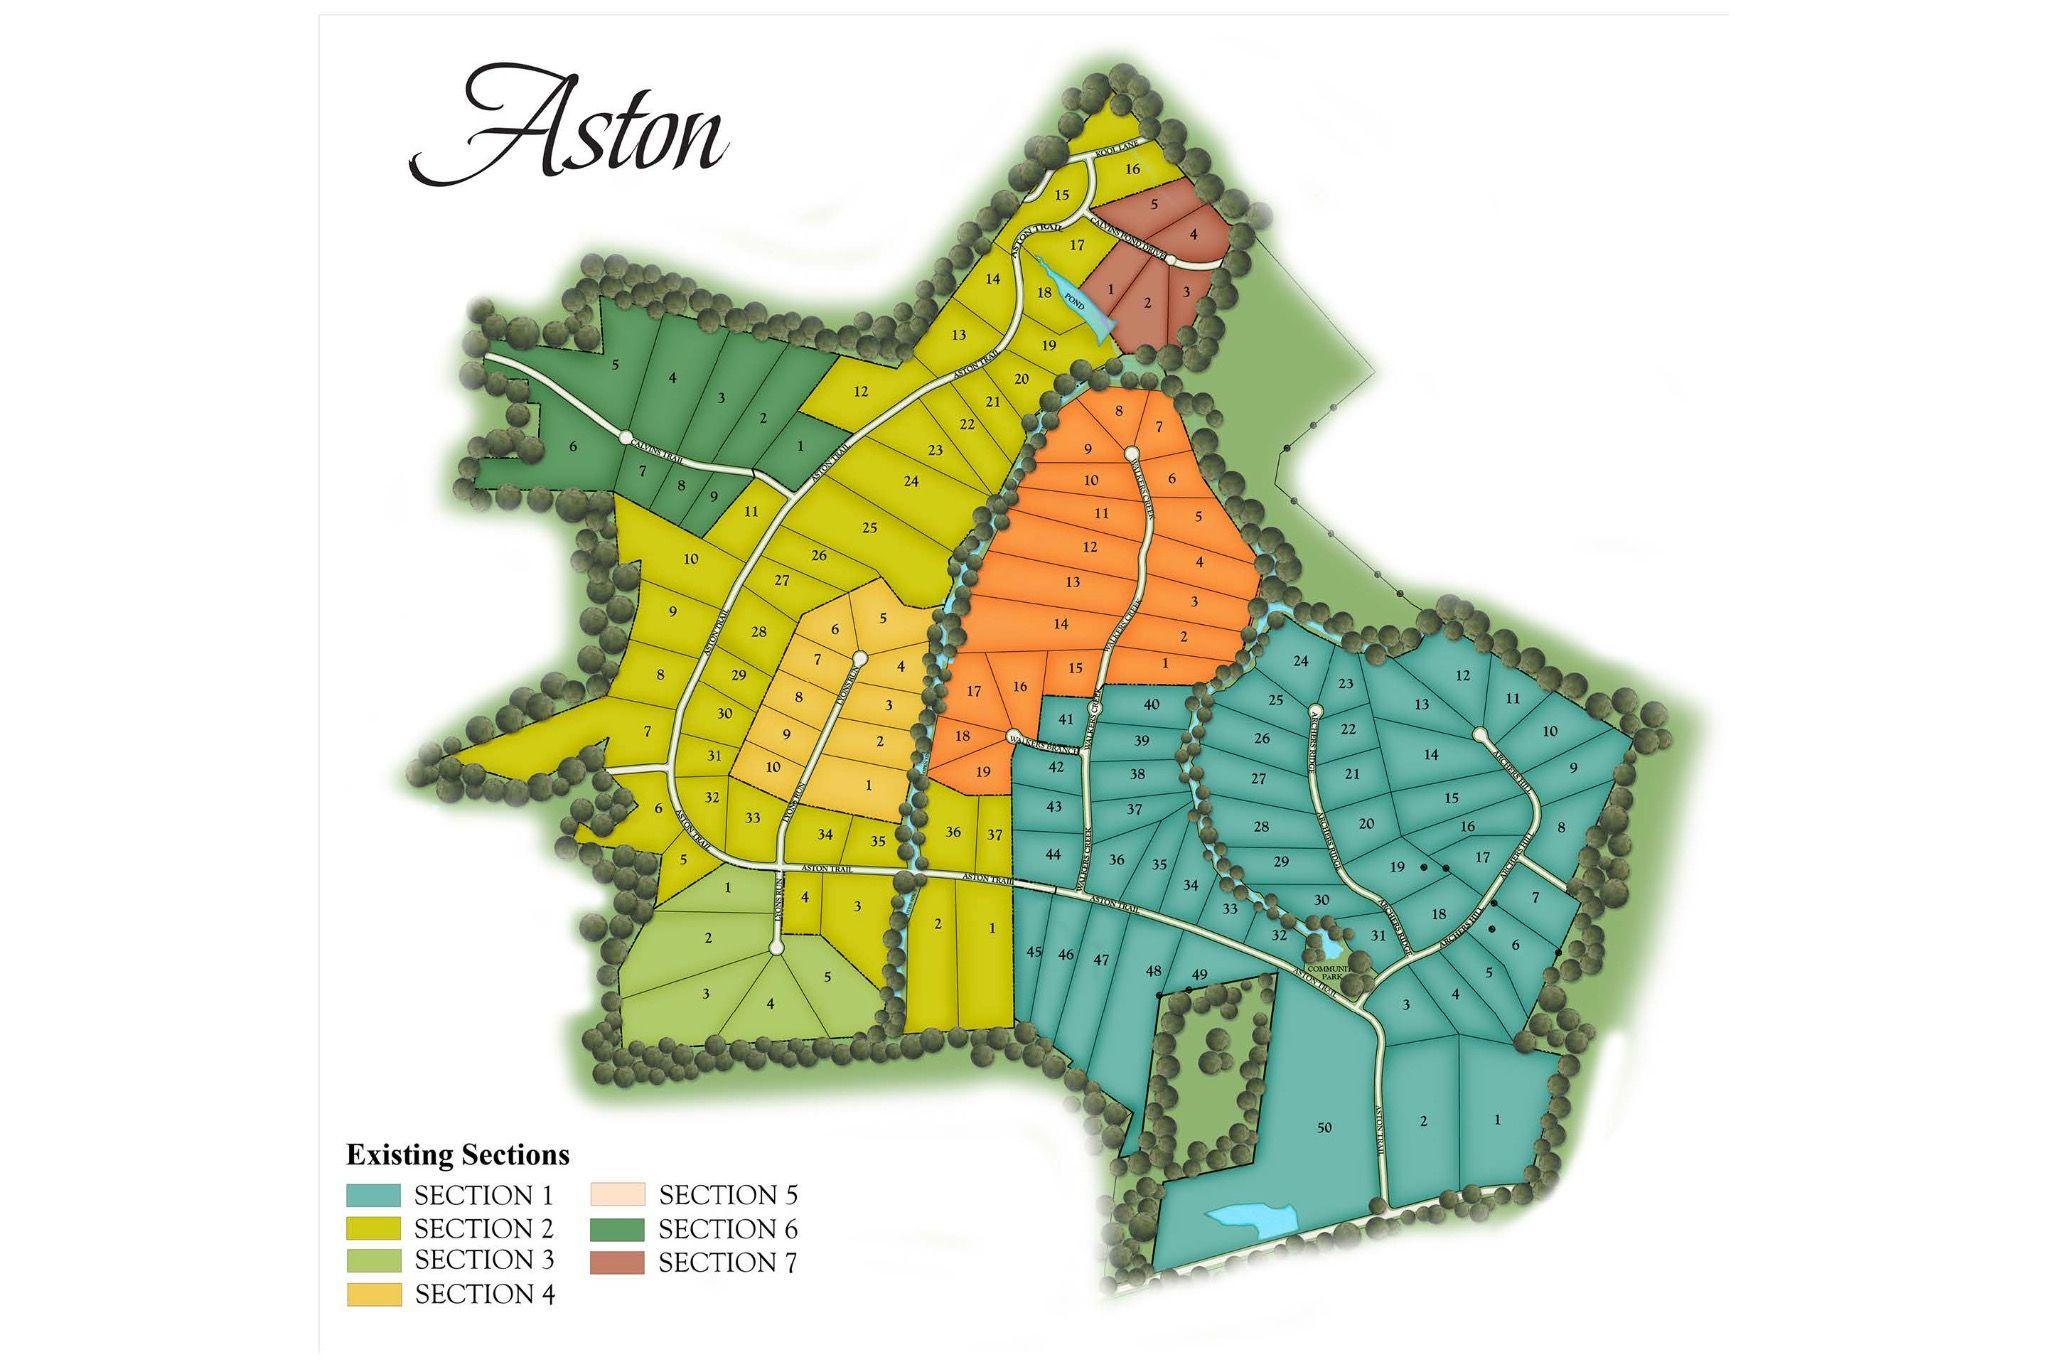 'Aston' by Main Street Homes in Richmond-Petersburg